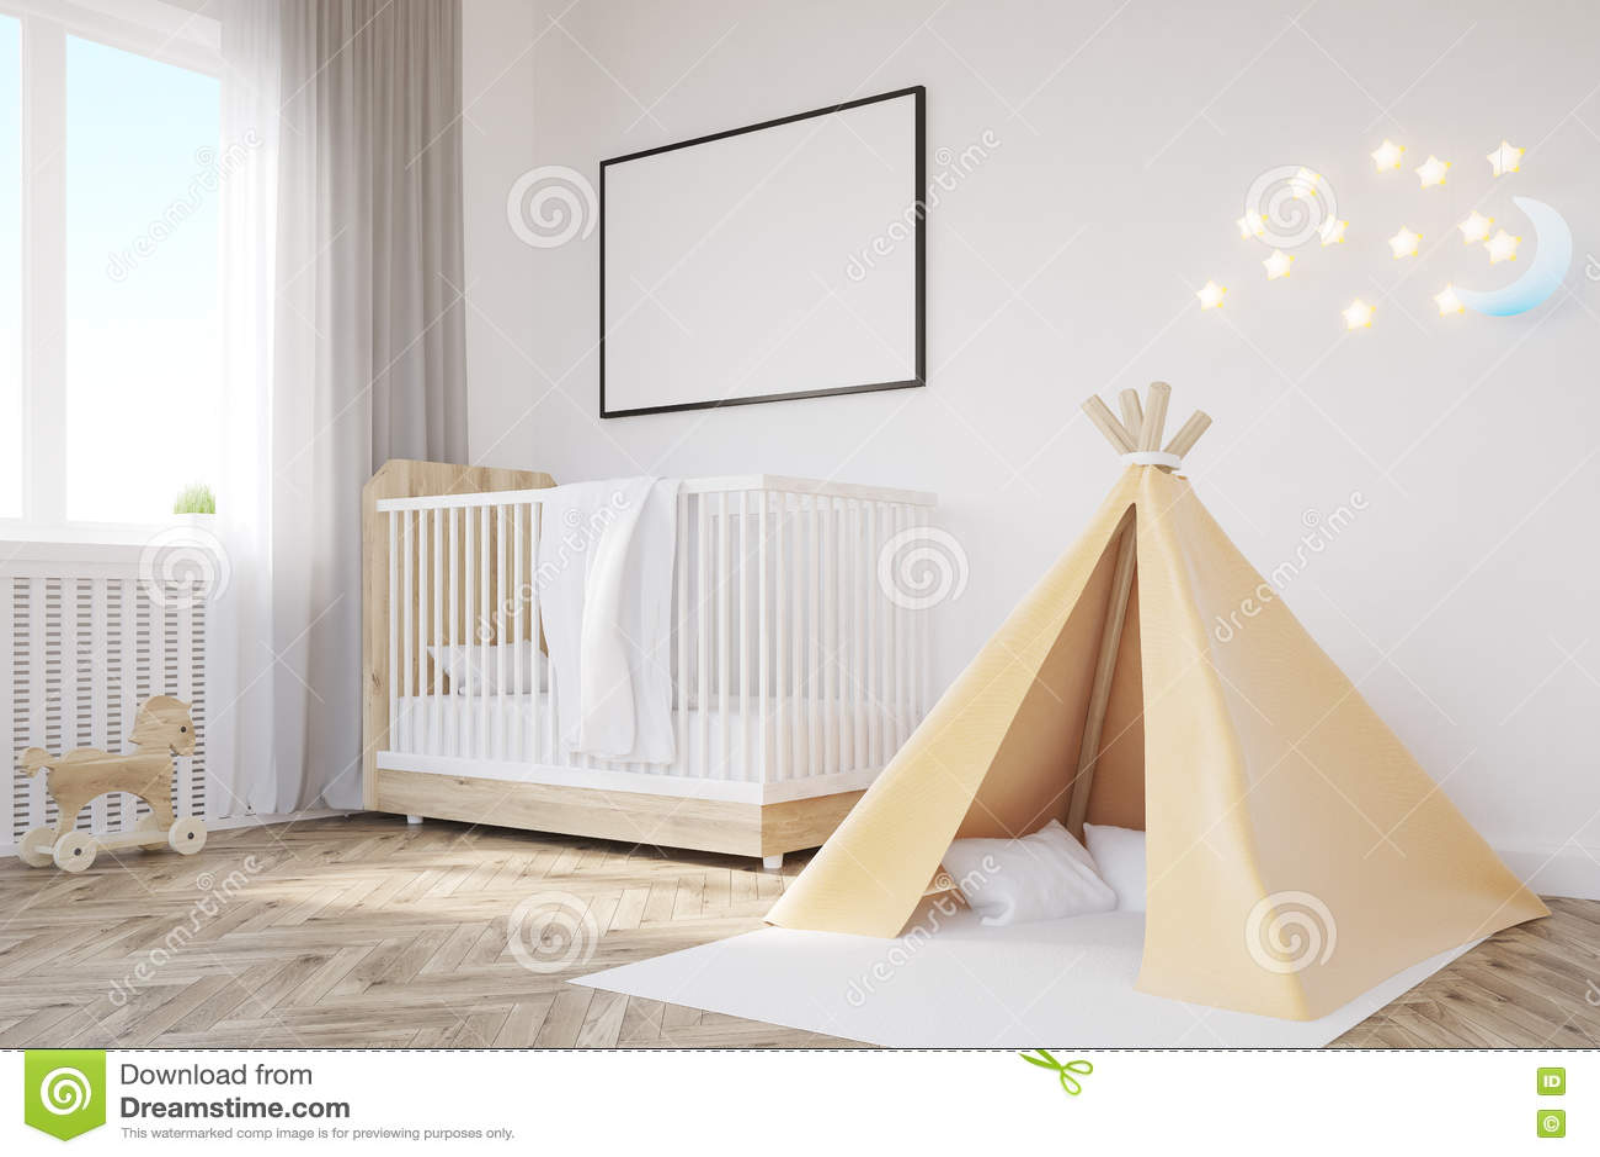 Crib tent & Baby`s room. Crib tent stock illustration. Illustration of bright ...